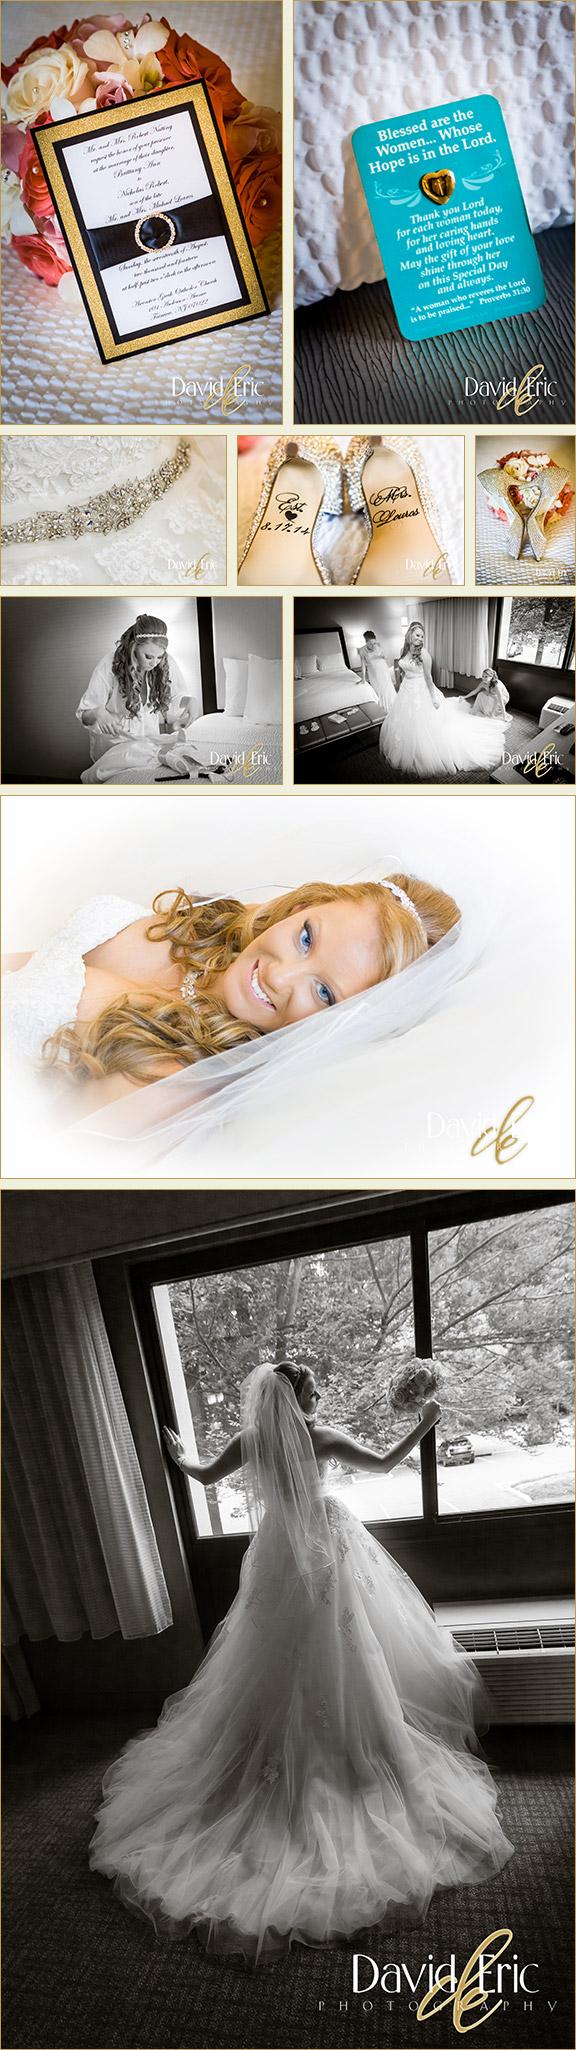 Seasons wedding washington twp New jersey_0038